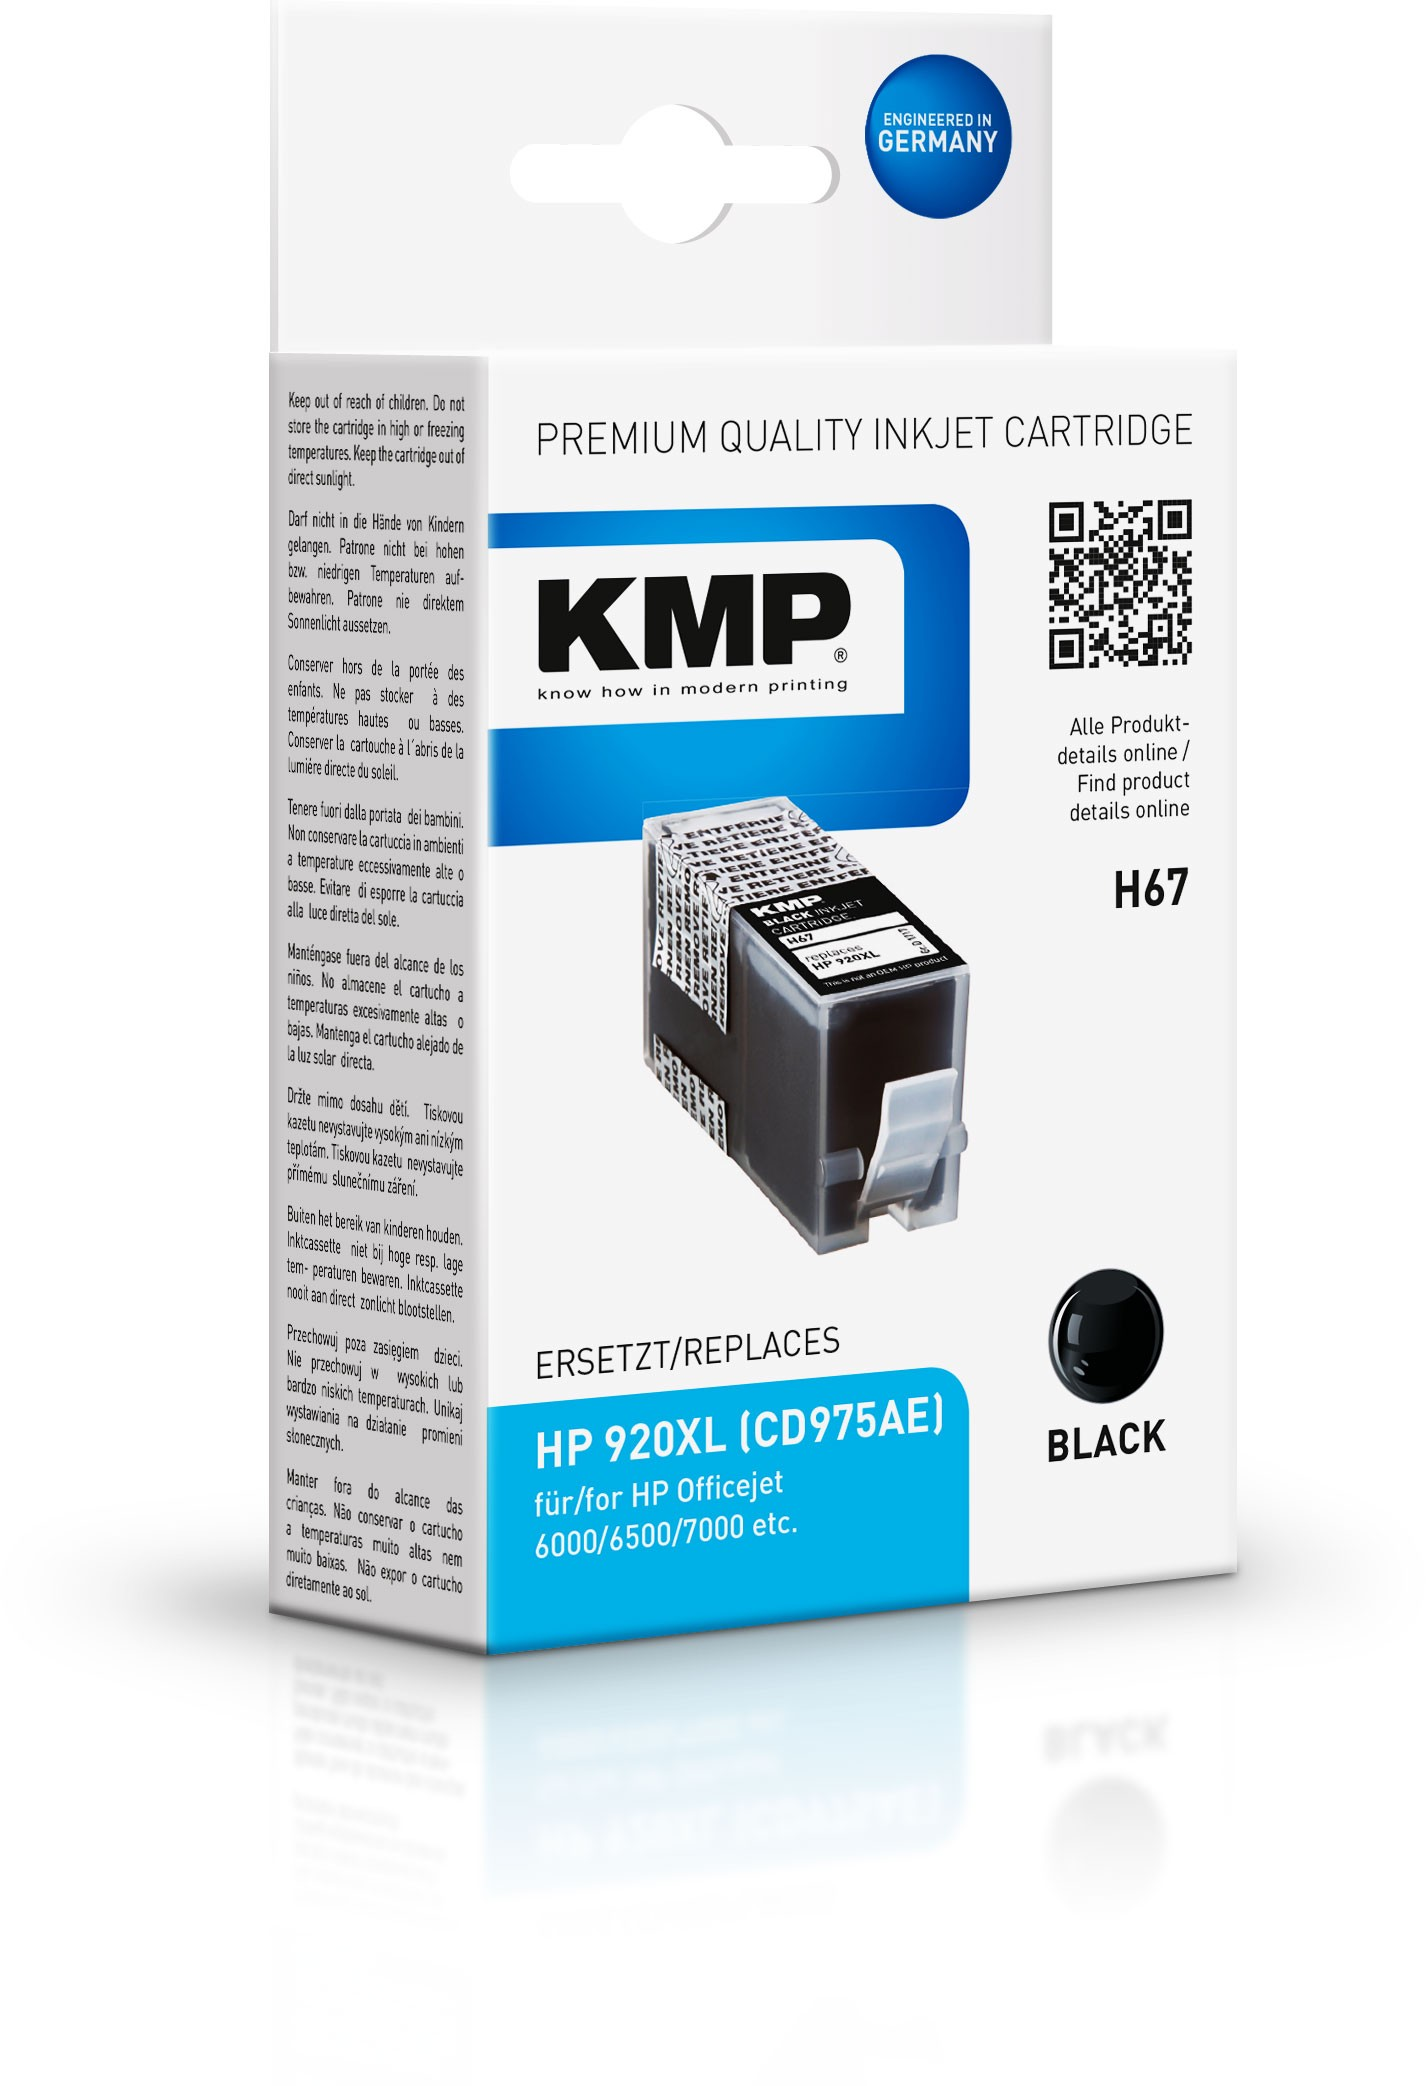 Vorschau: KMP Patrone H67 HP 920XL (CD975AE) Officejet 6000/6500/7000 schwarz